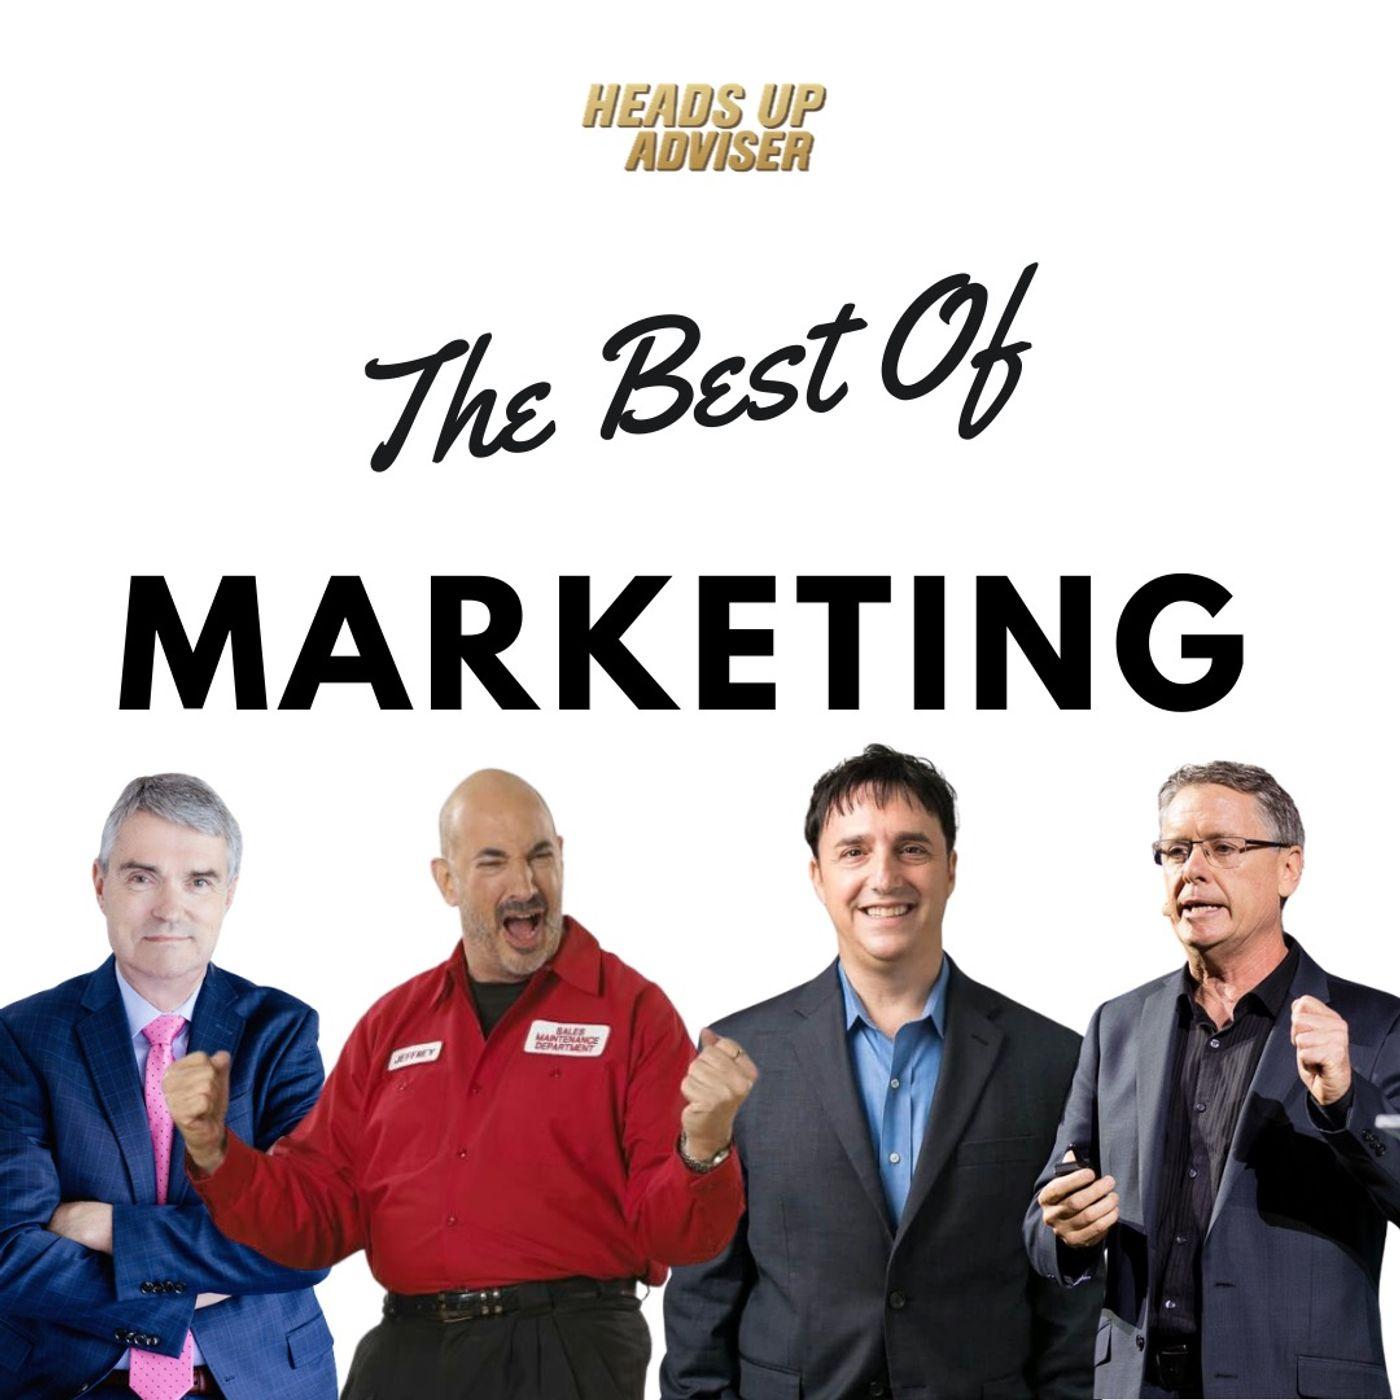 The Best Of Marketing For Insurance Brokers - Tony J. Hughes, Jeffrey Gitomer, Neal Schaffer, Mark Hunter